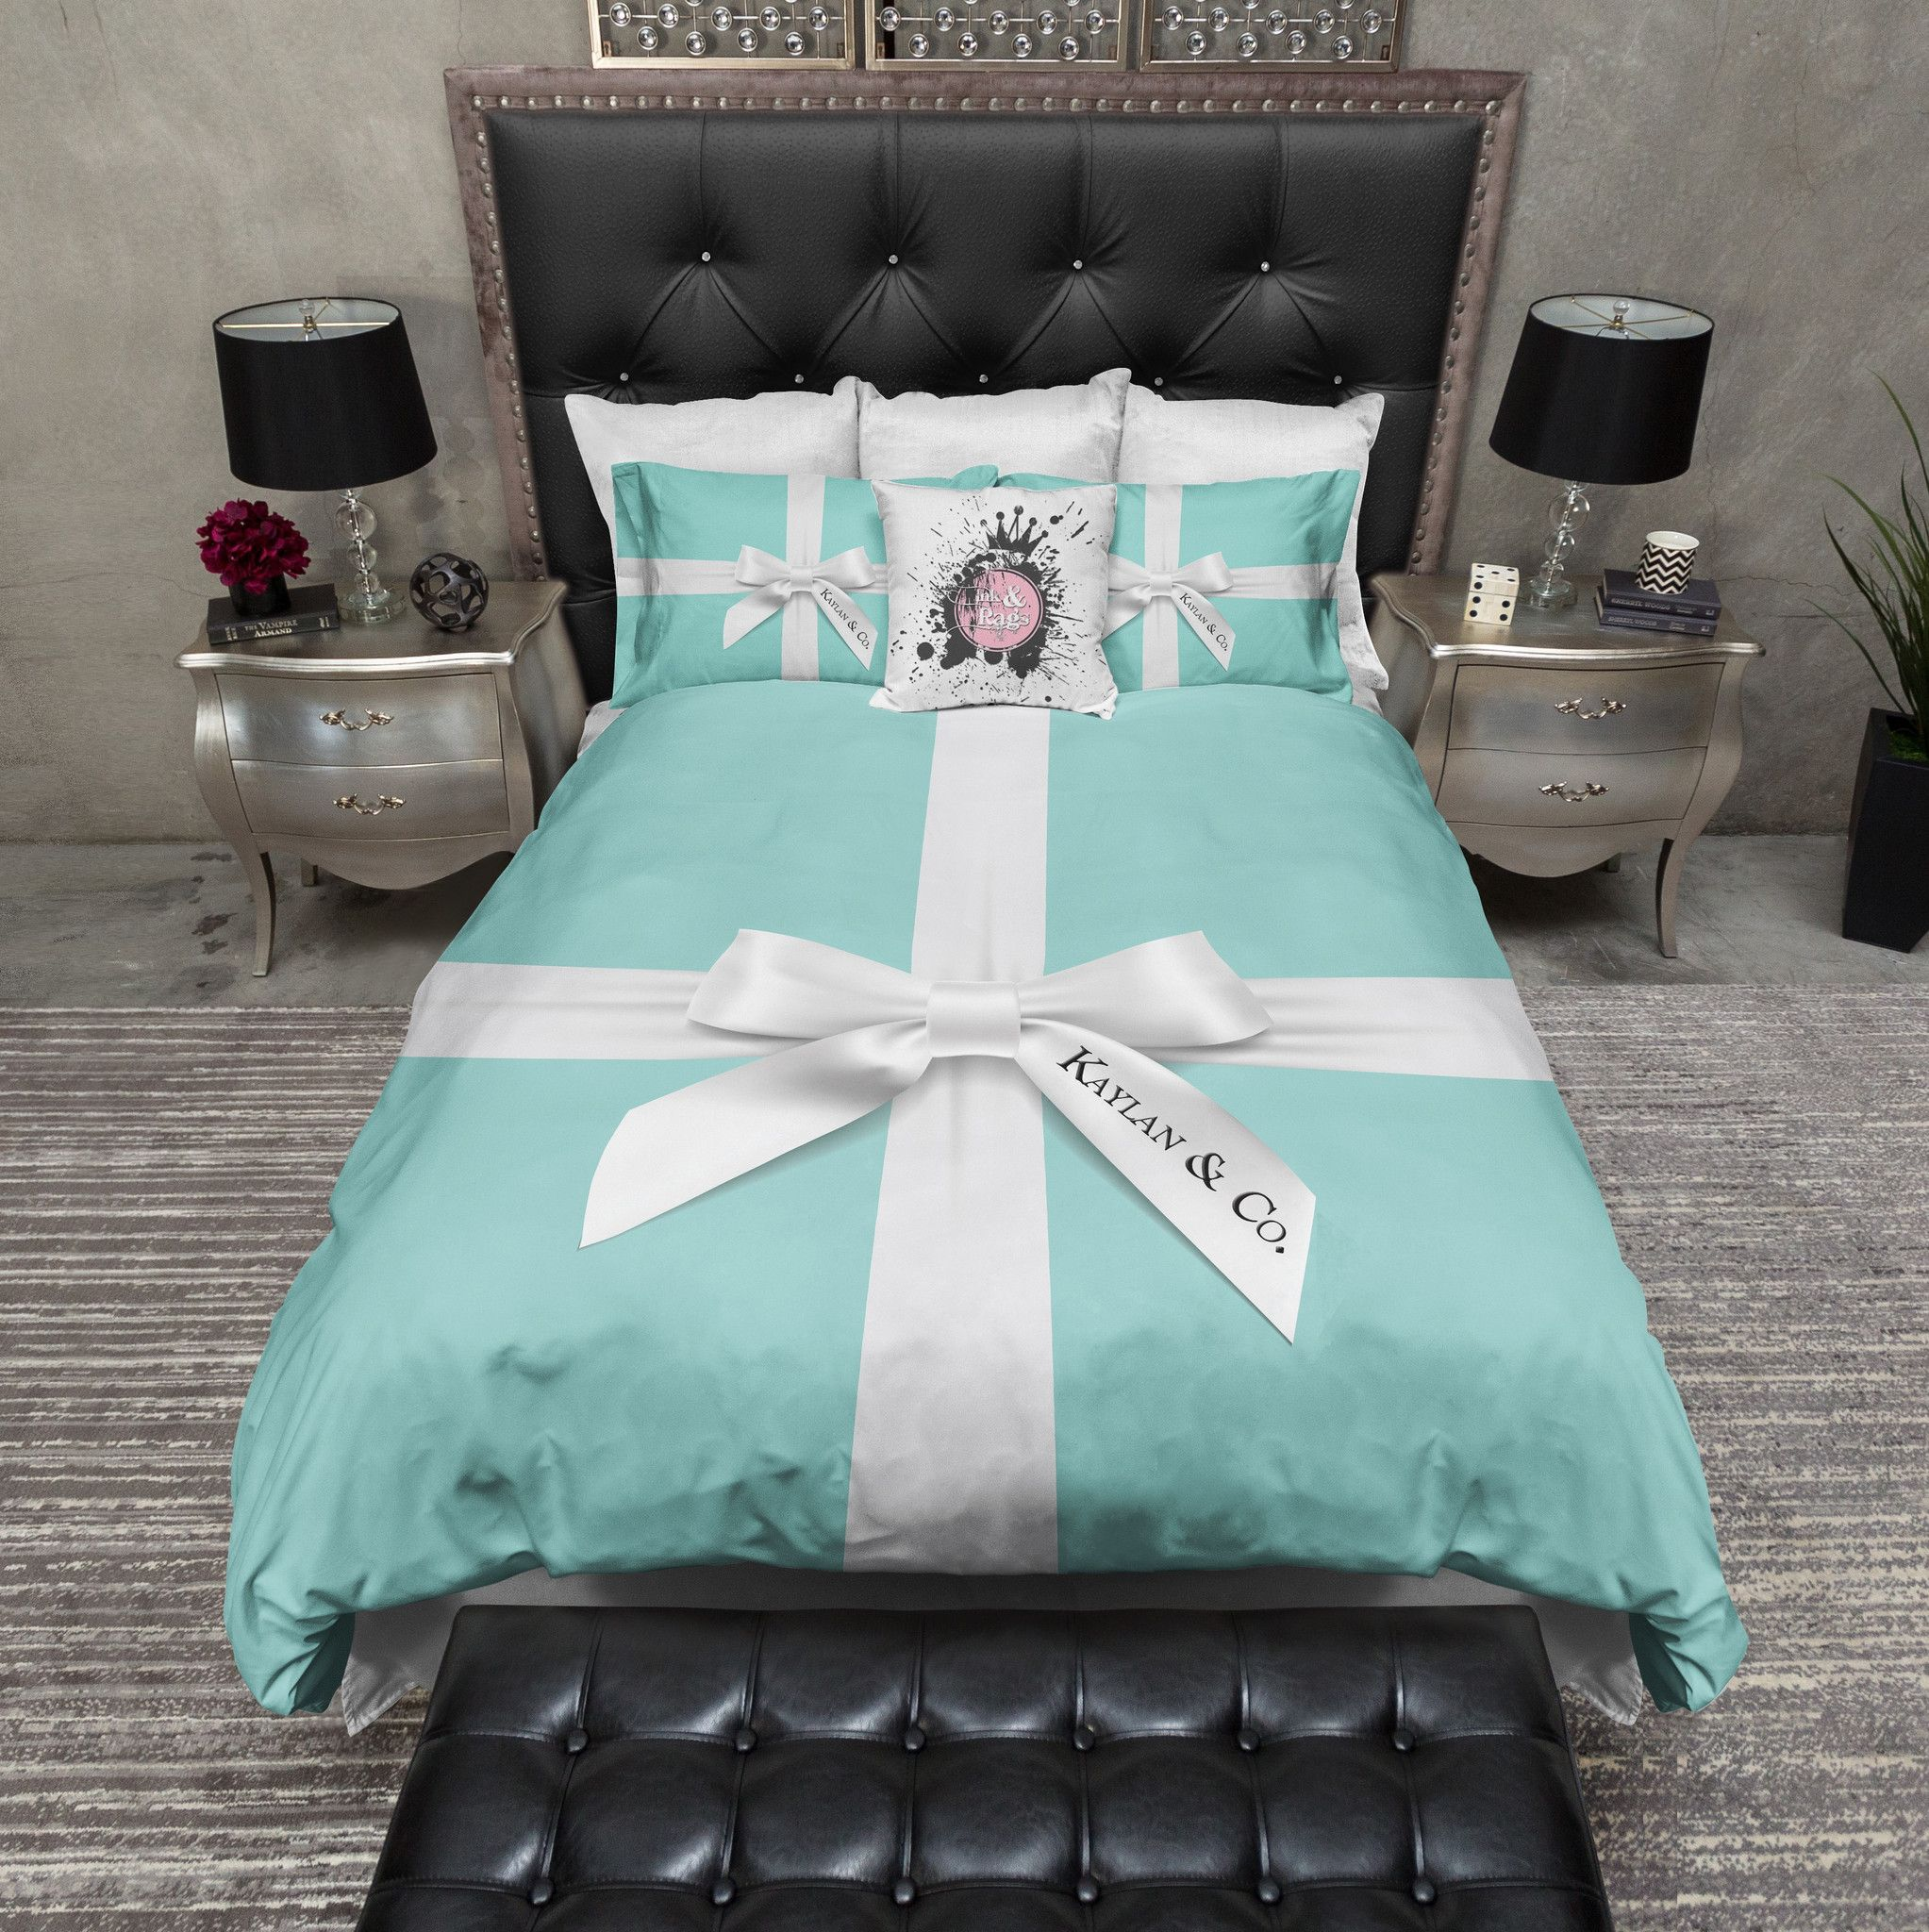 Name & Co Personalized Bedding | Duvet bedding, Bedding sets and Duvet